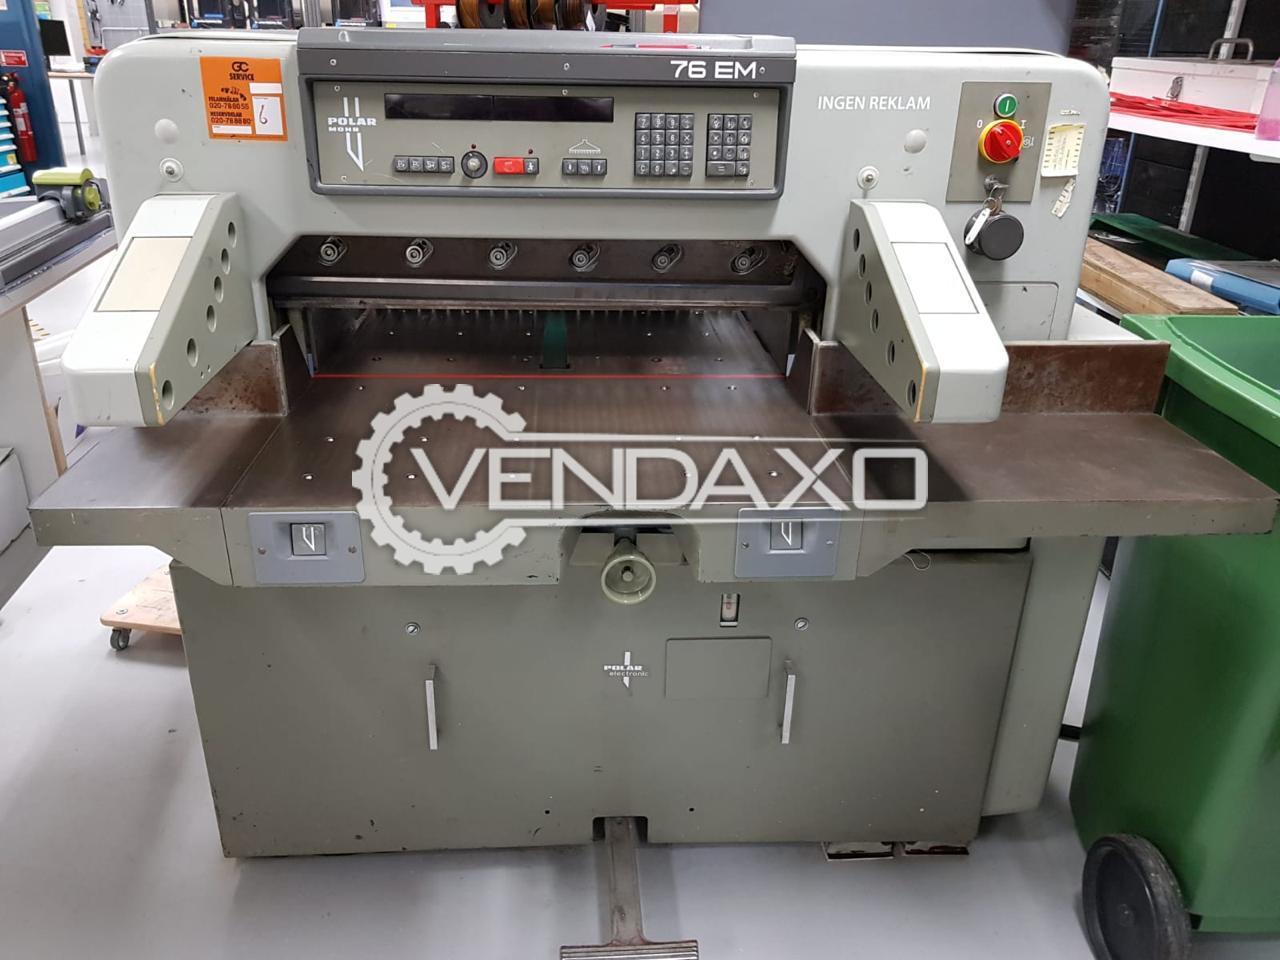 Polar Mohr 76 EM Paper Cutting Machine - 30 Inch